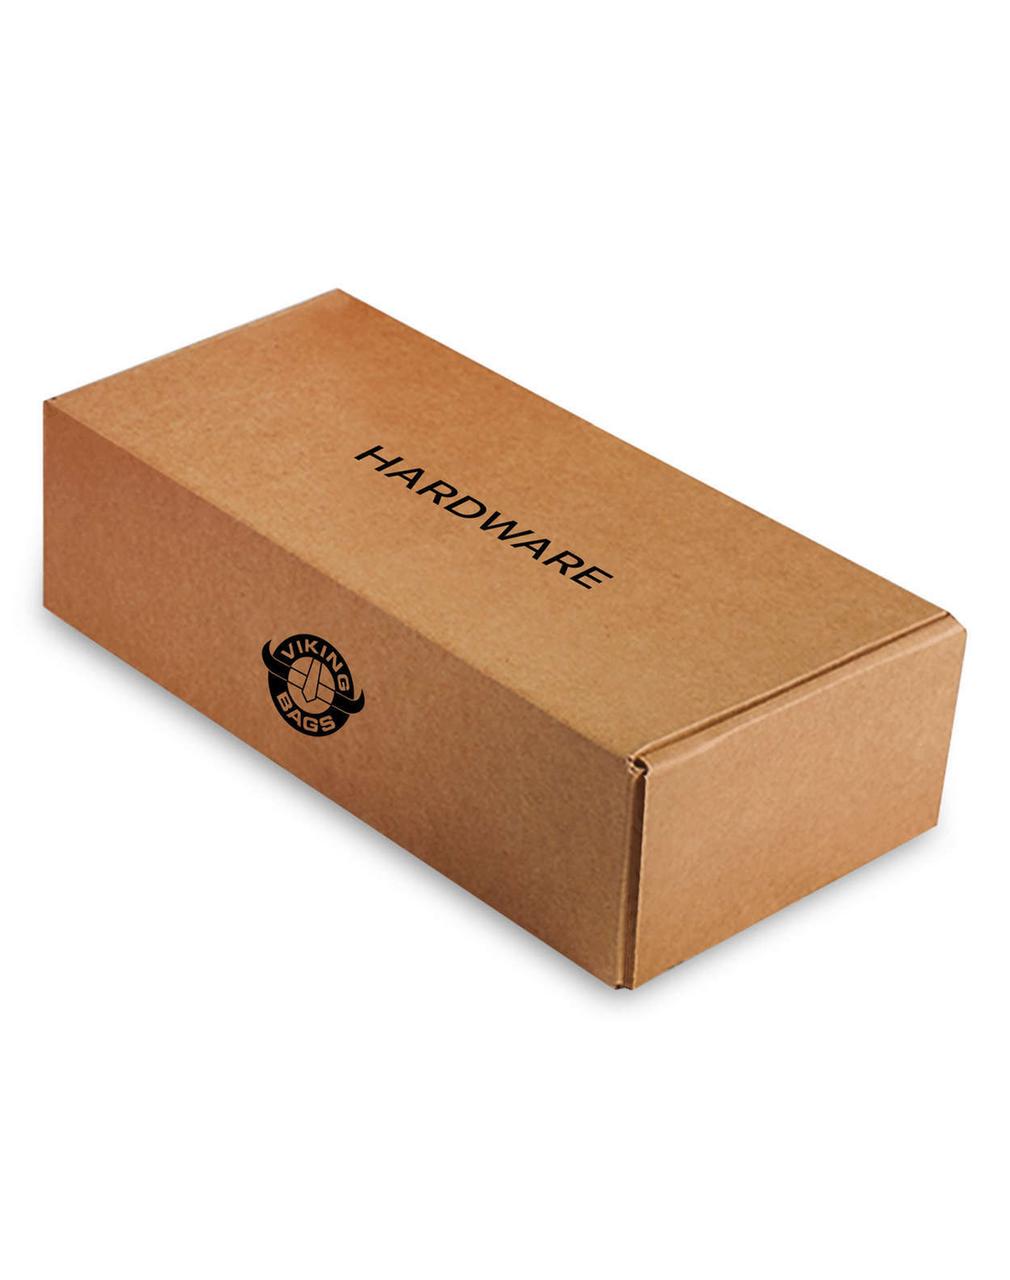 Victory Judge Trianon Motorcycle Saddlebags Hardware Box